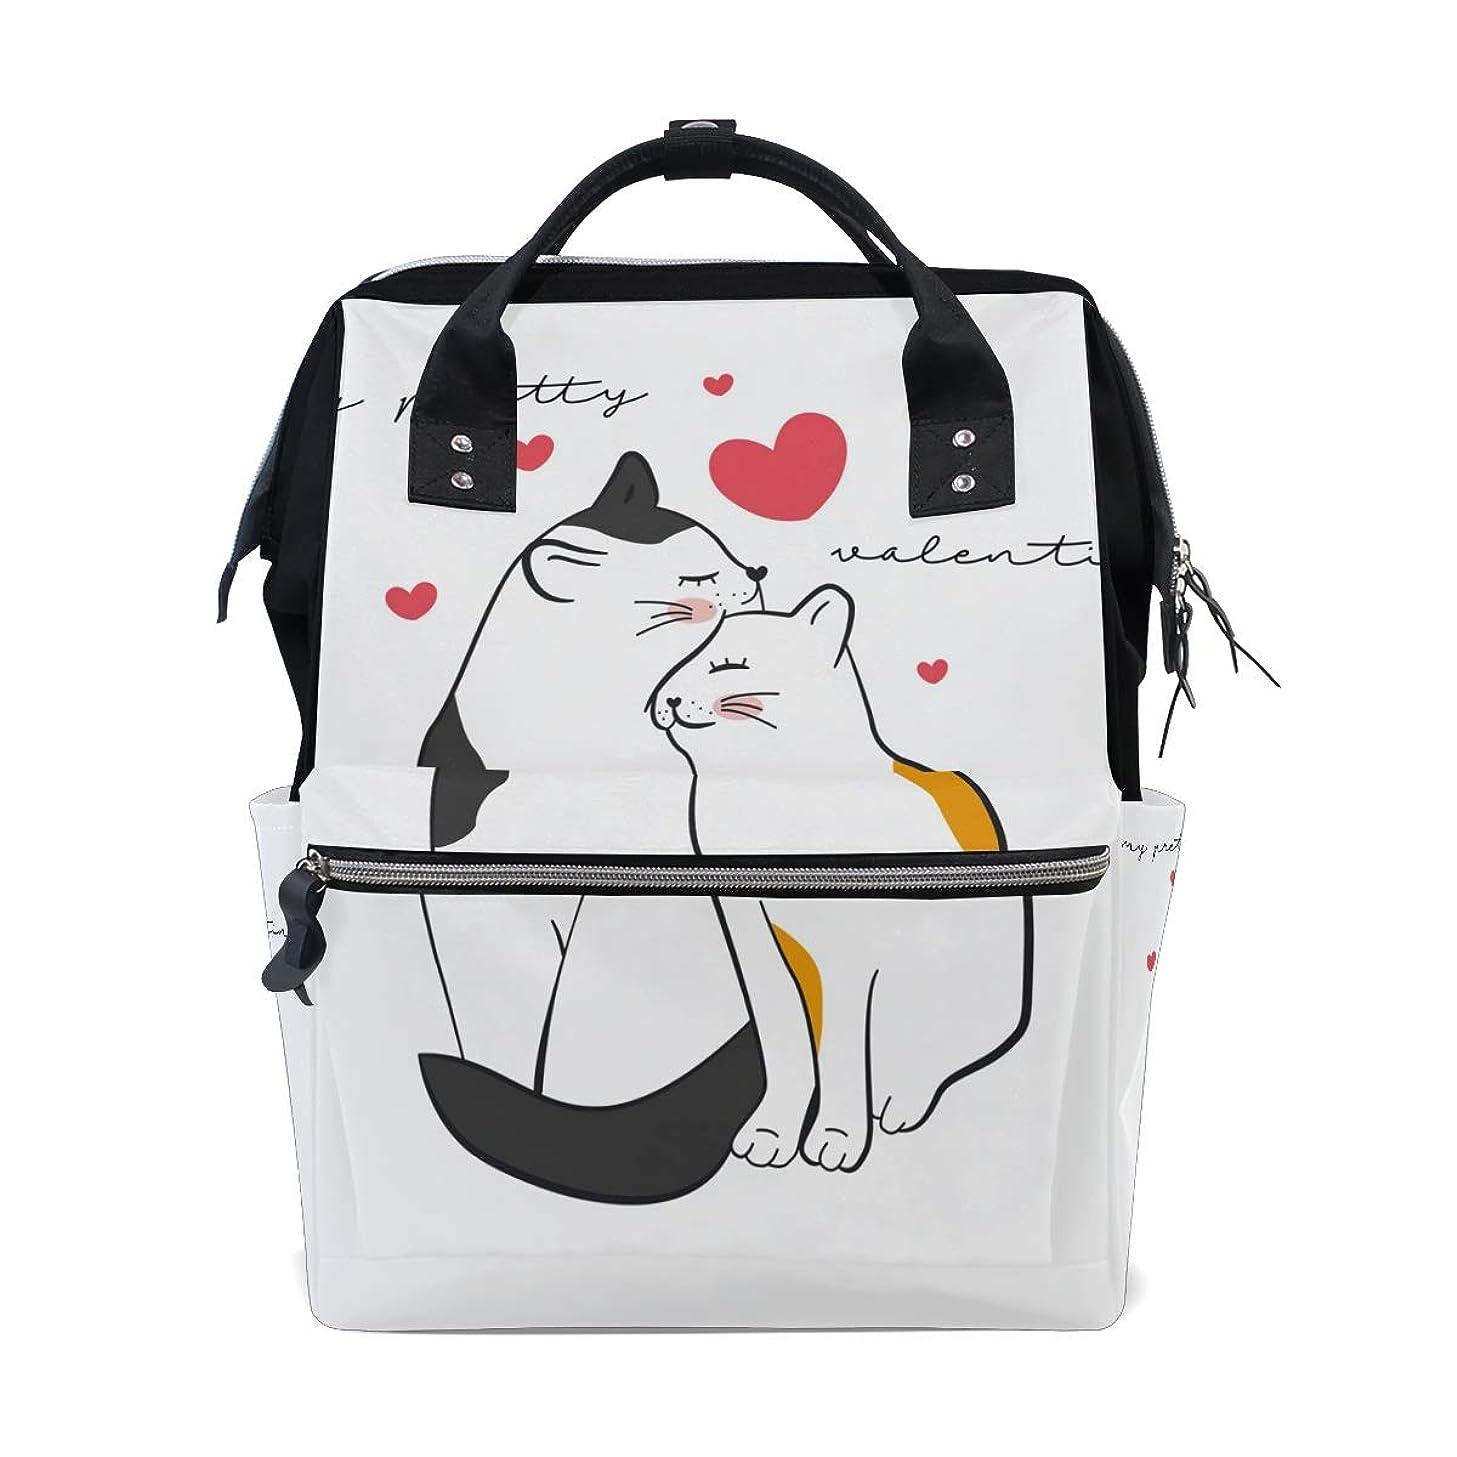 Backpack Valentine's Two Cat Heart School Rucksack Diaper Bags Travel Shoulder Large Capacity Bookbag for Women Men